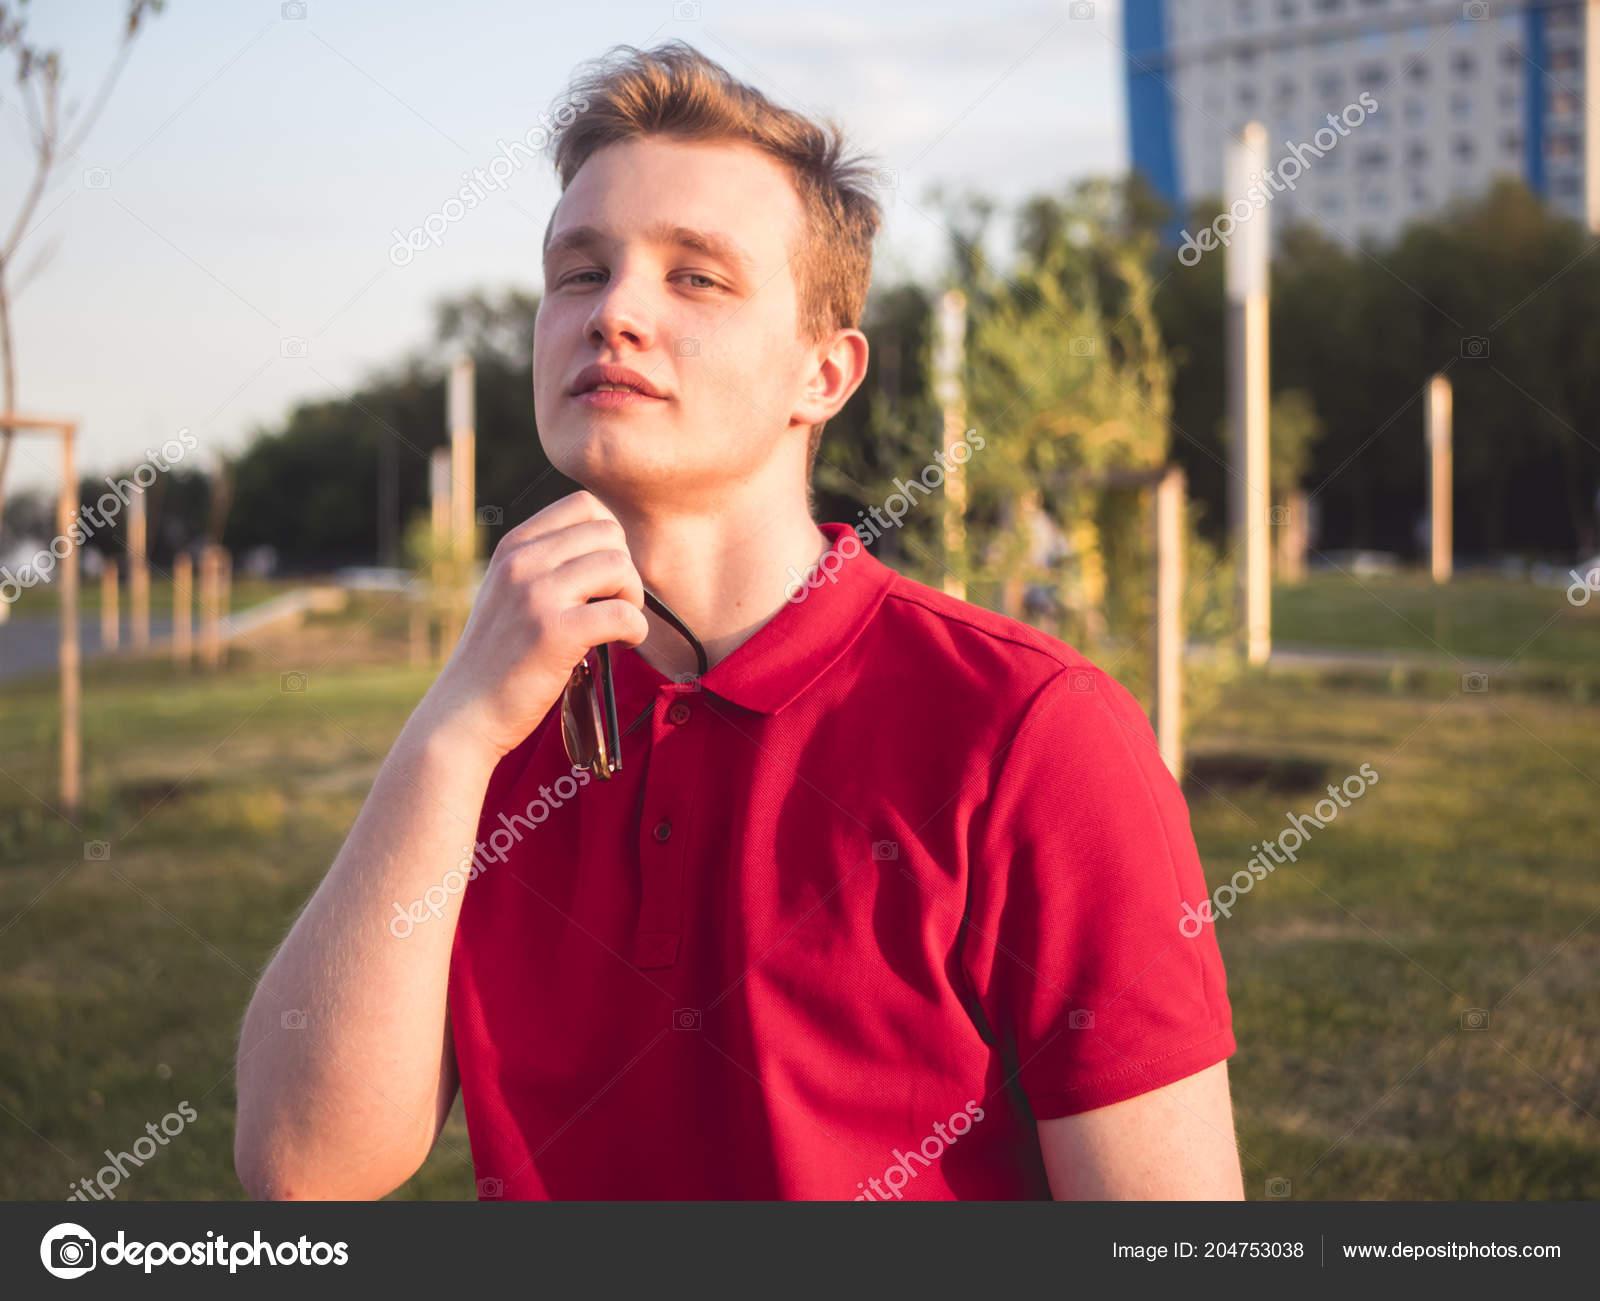 Cute guy in the street